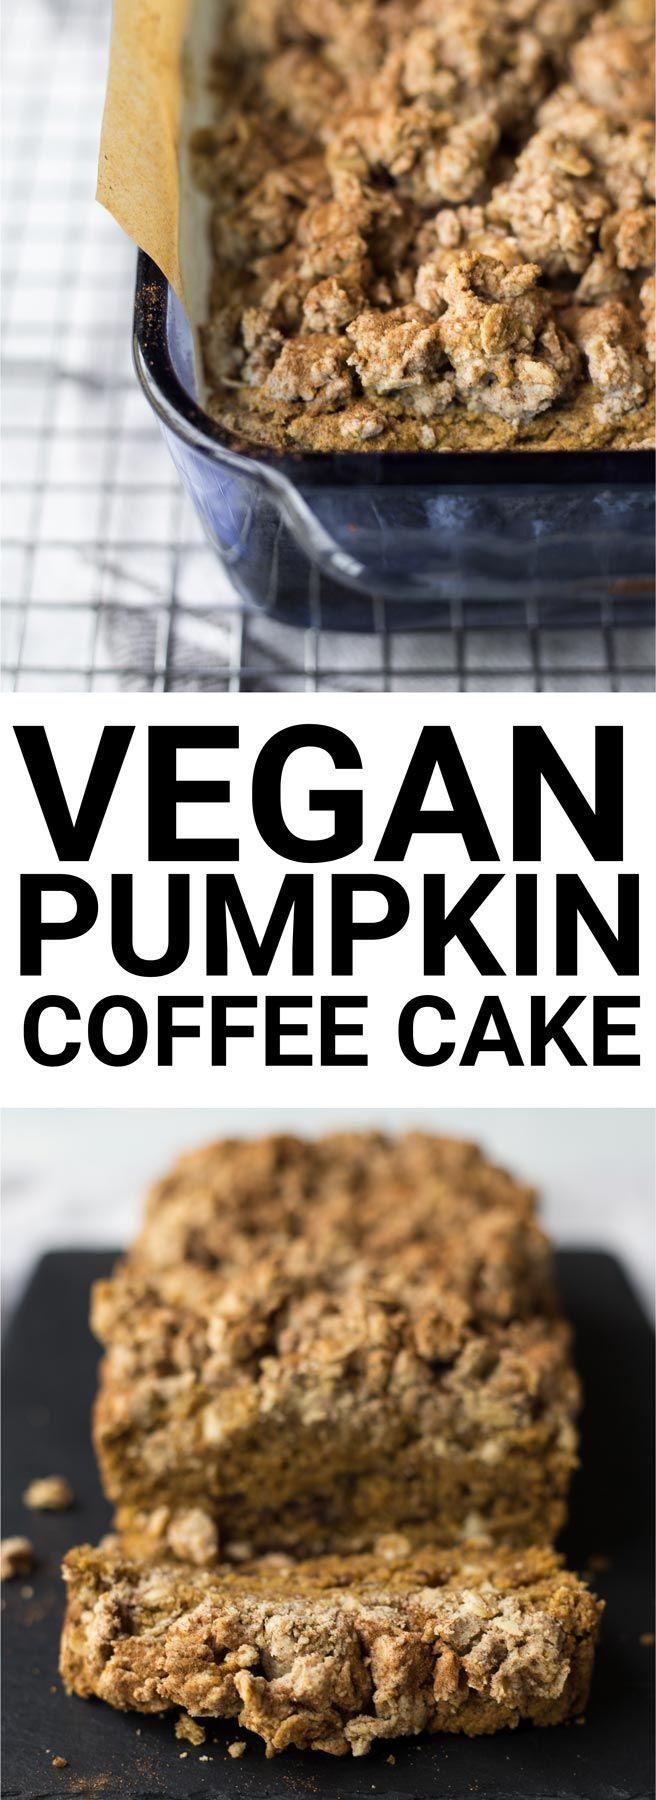 Easy Gluten Free Vegan Pumpkin Coffee Cake Recipe (Dairy